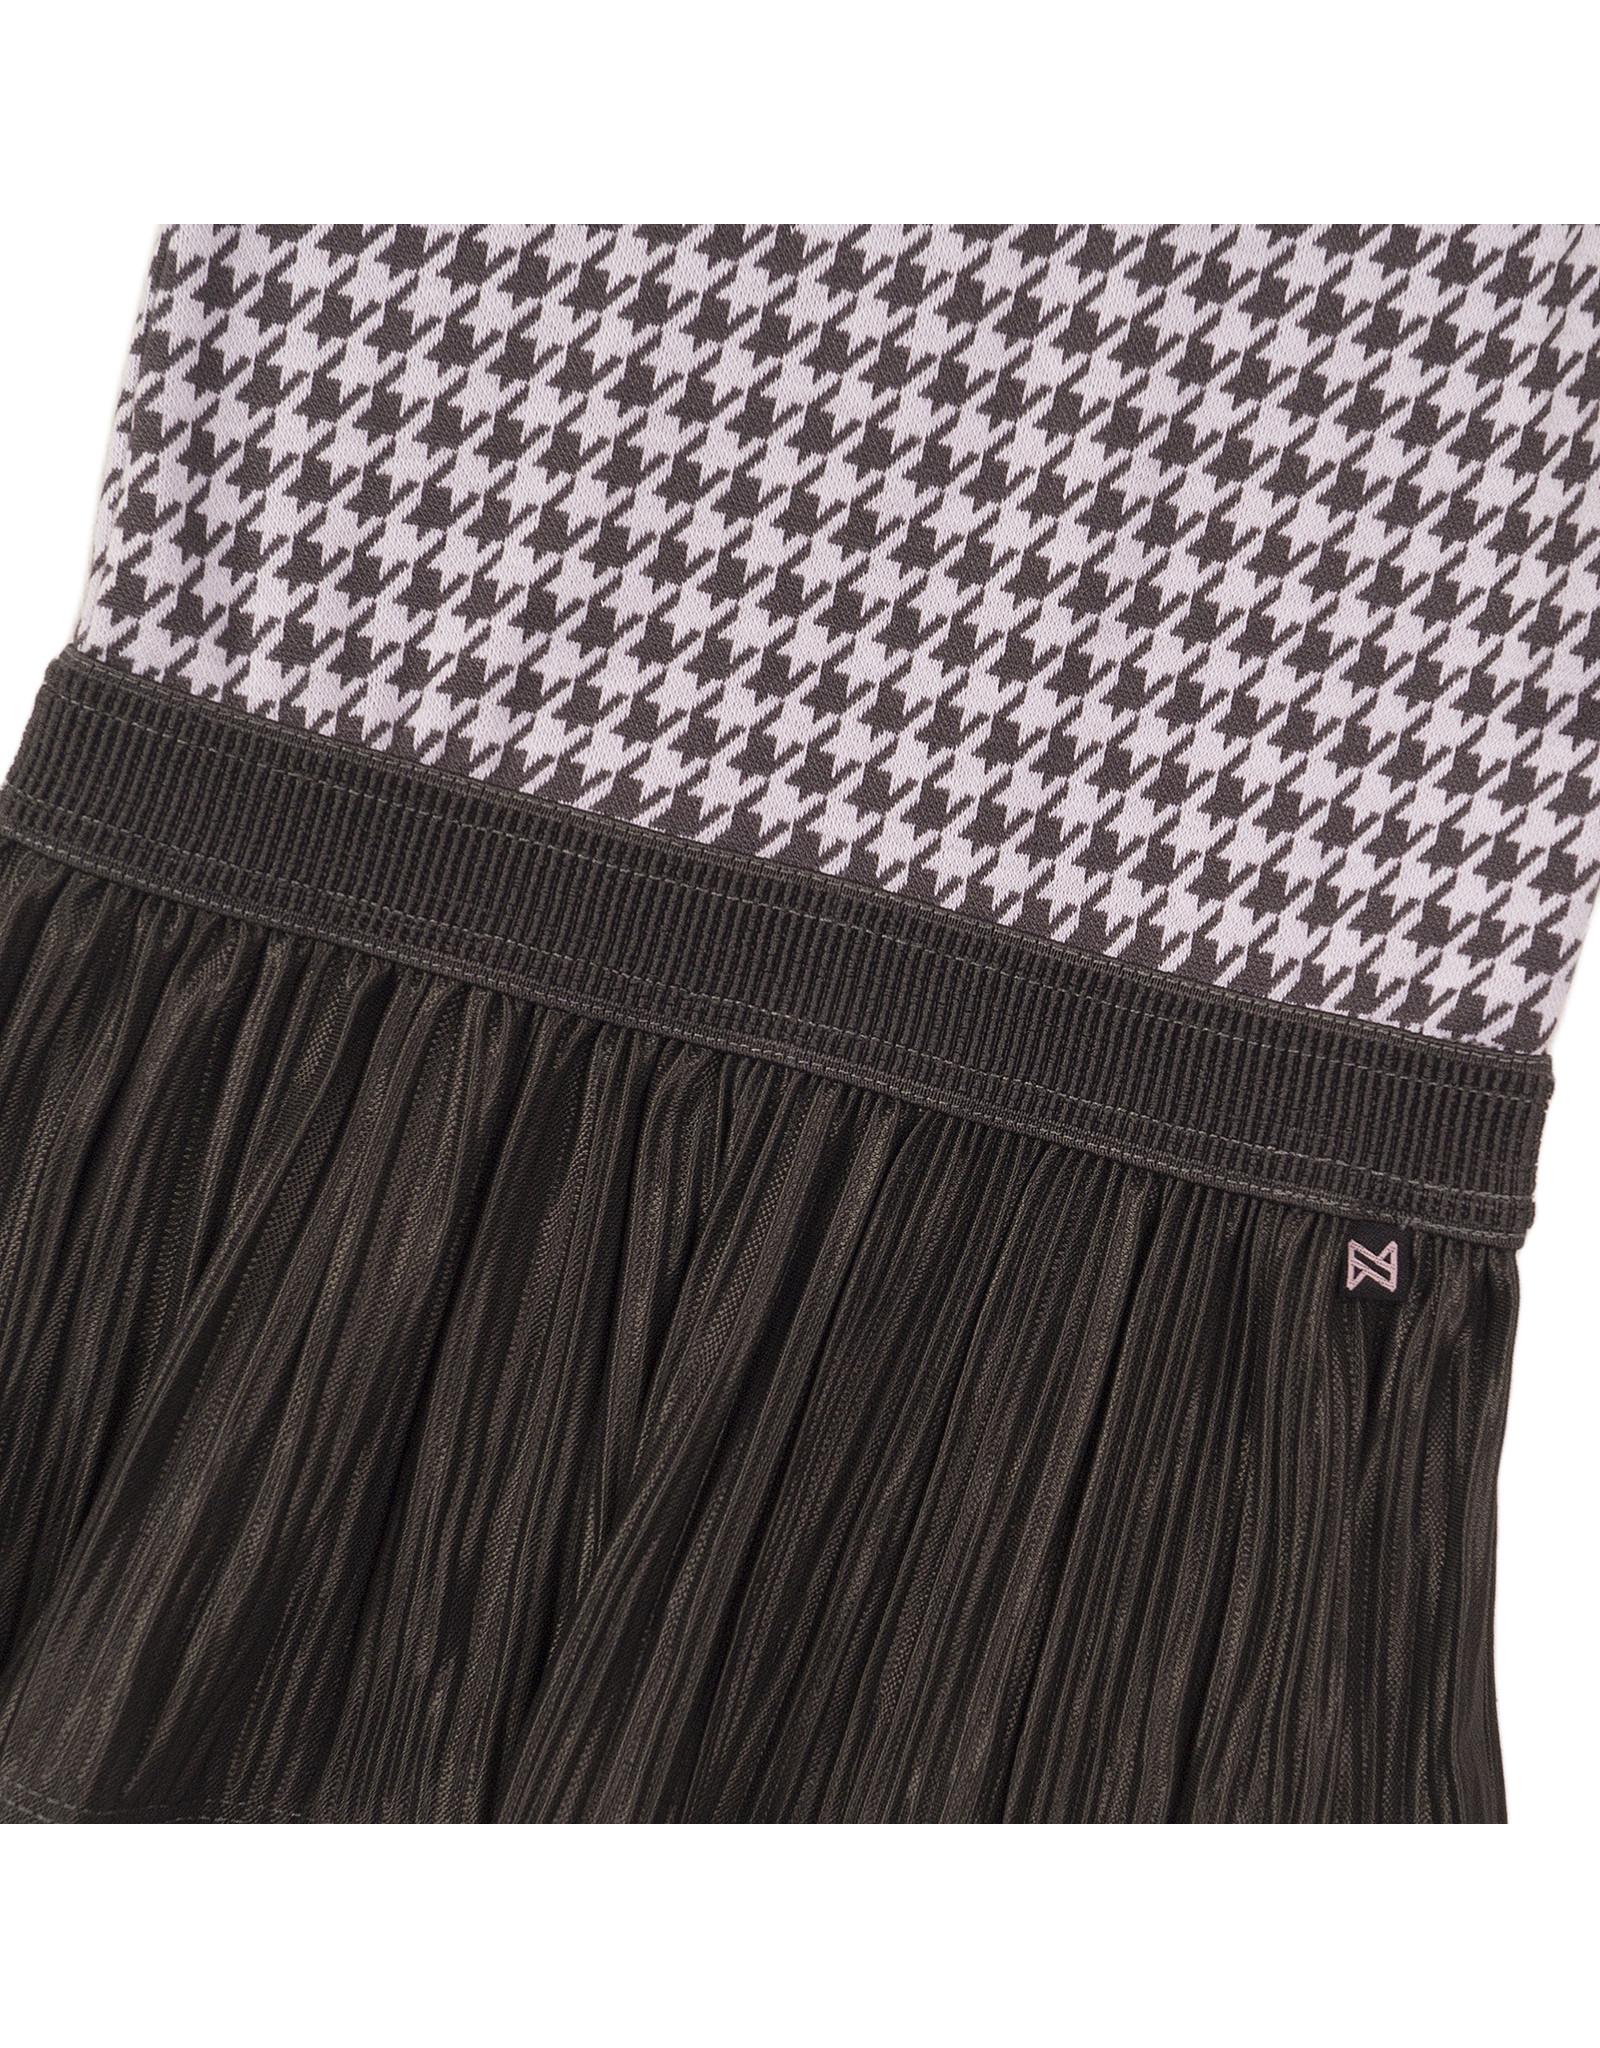 Koko Noko Dress ss, Dark grey + off white, SS21